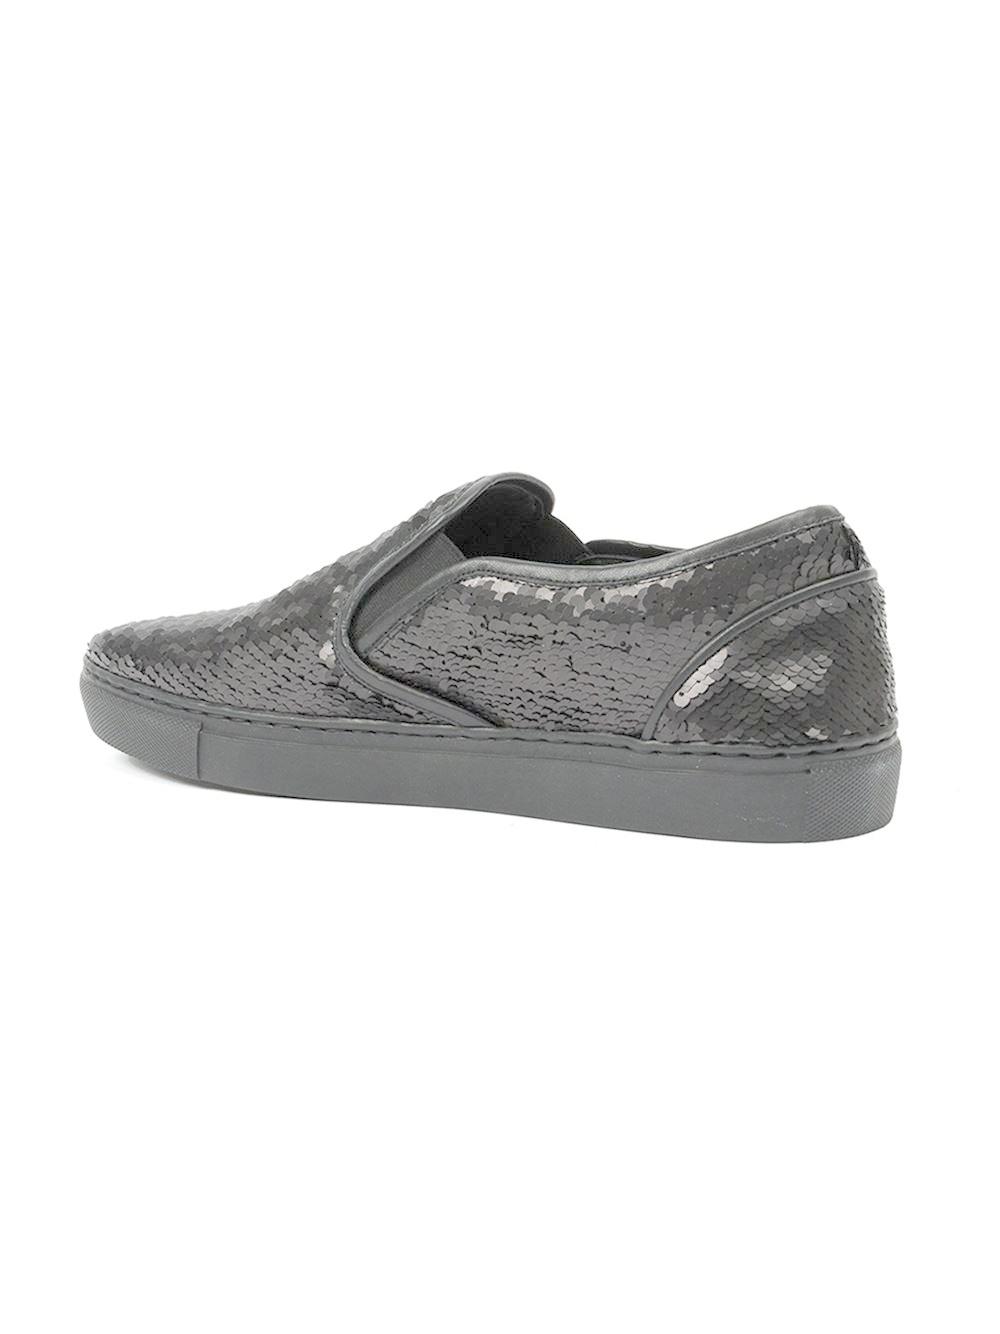 juun j sequin slip on shoes in black for lyst